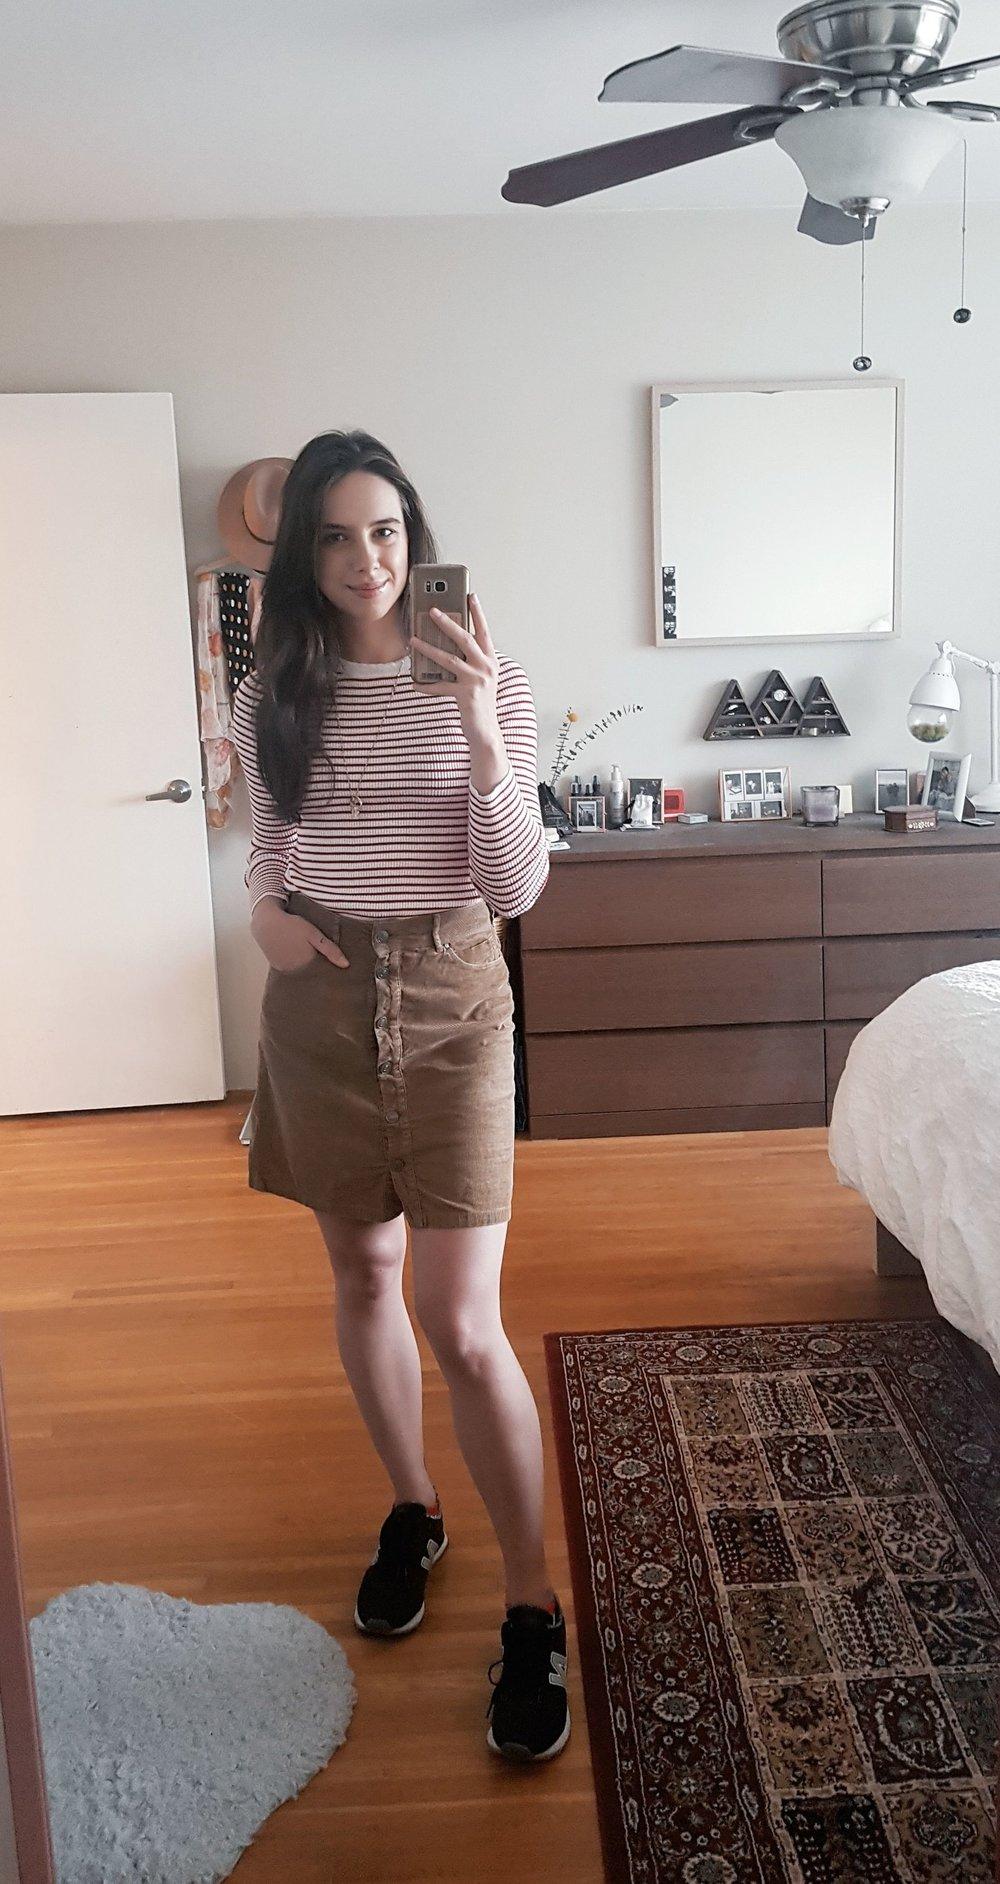 FRIDAY - Forever21 sweater, Zara skirt, New Balance shoes